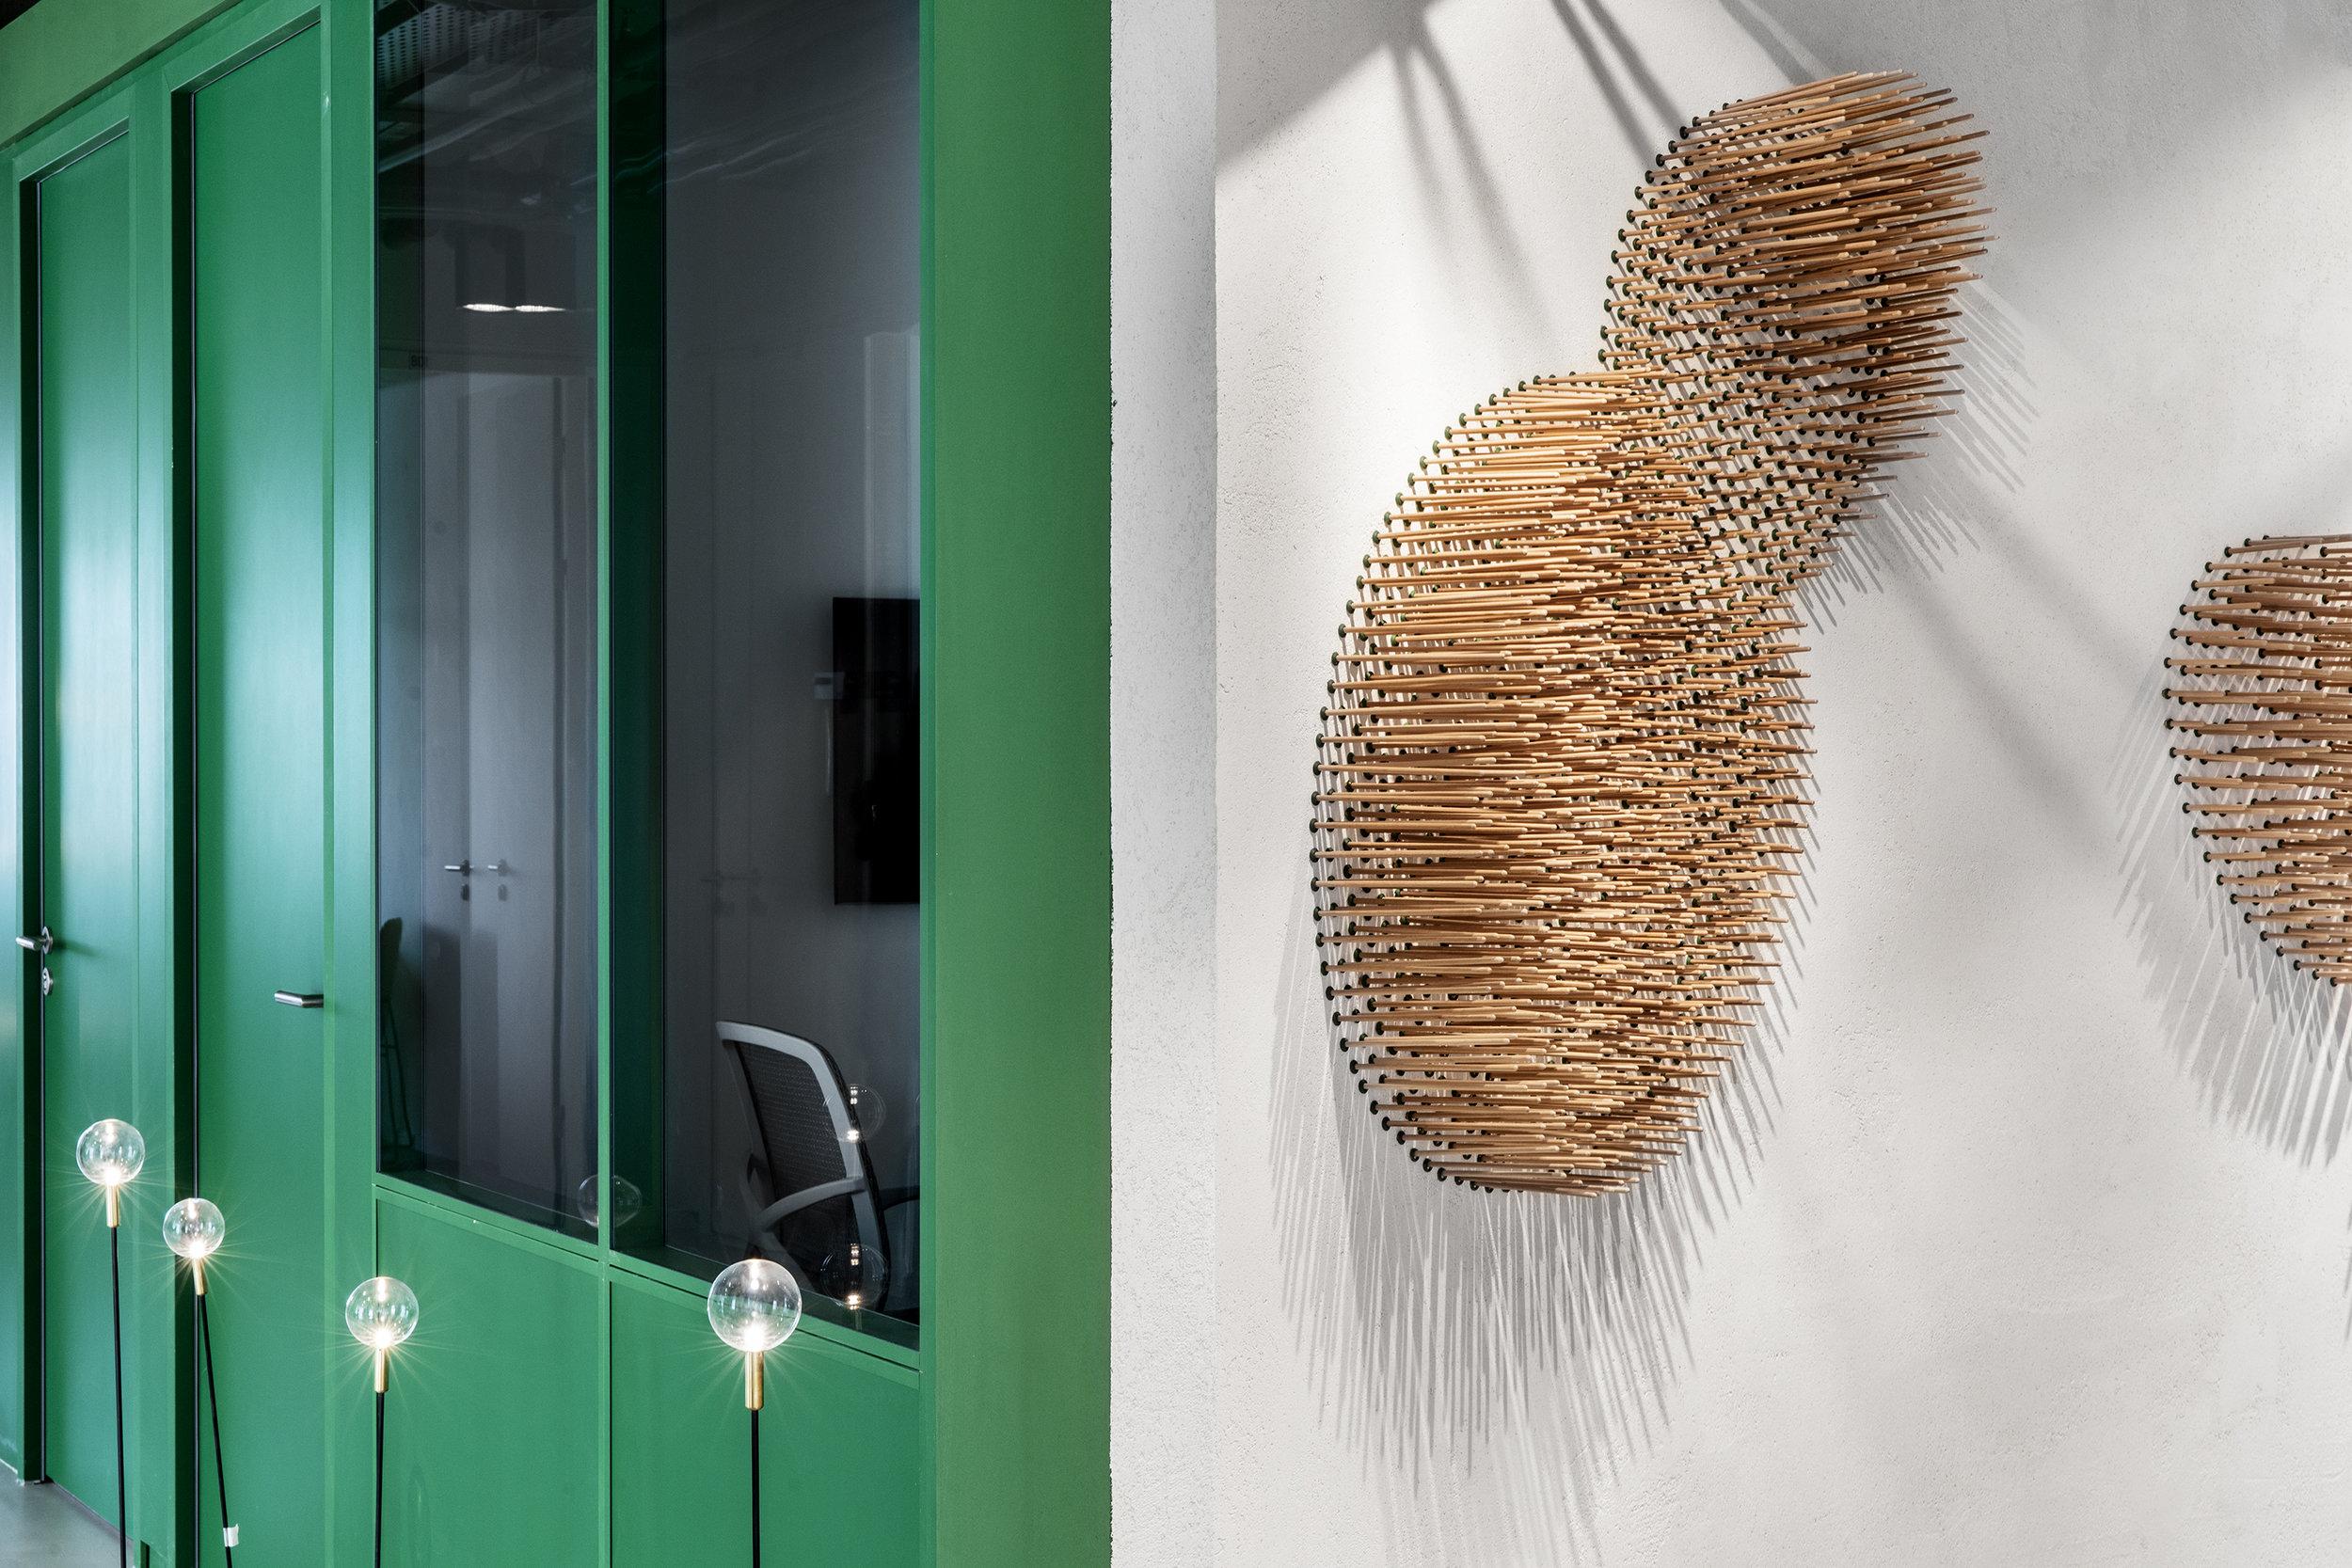 HINNOMAN - ROY DAVID ARCHTECTURE - STUDIO - סטודיו רואי דוד - אדריכלים (8).jpg